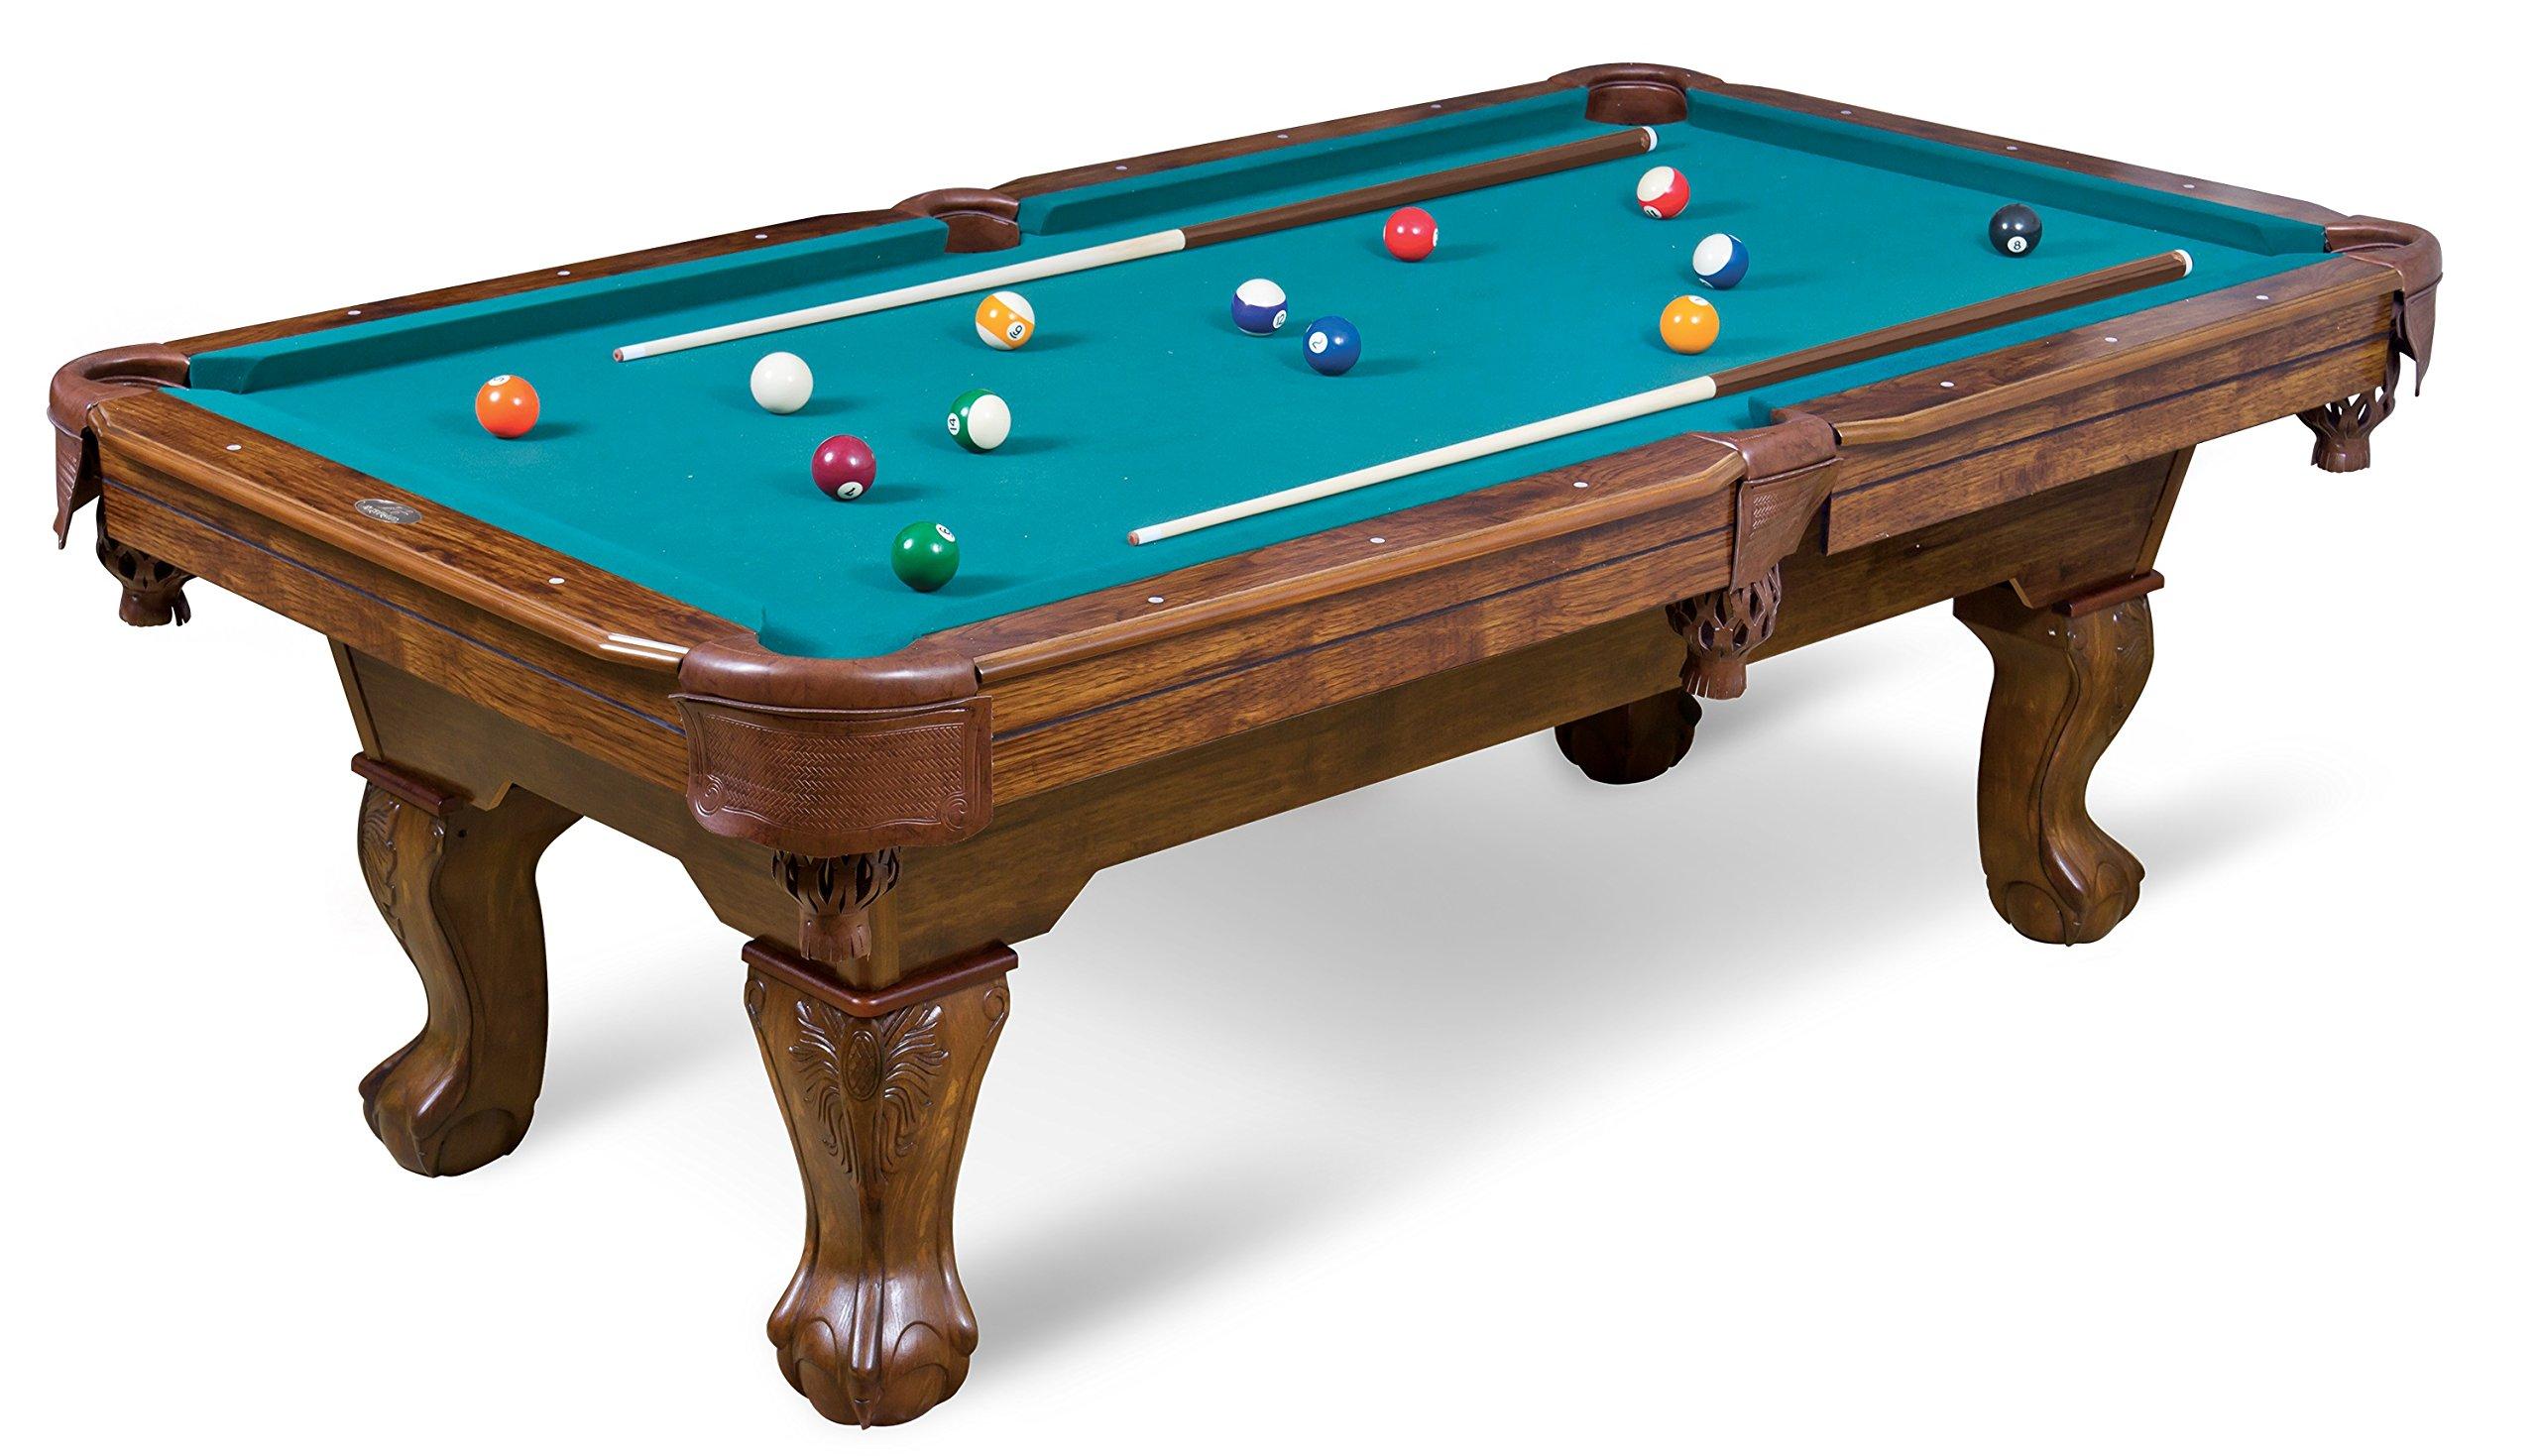 EastPoint Sports Brighton Billiard Table, 87-Inch